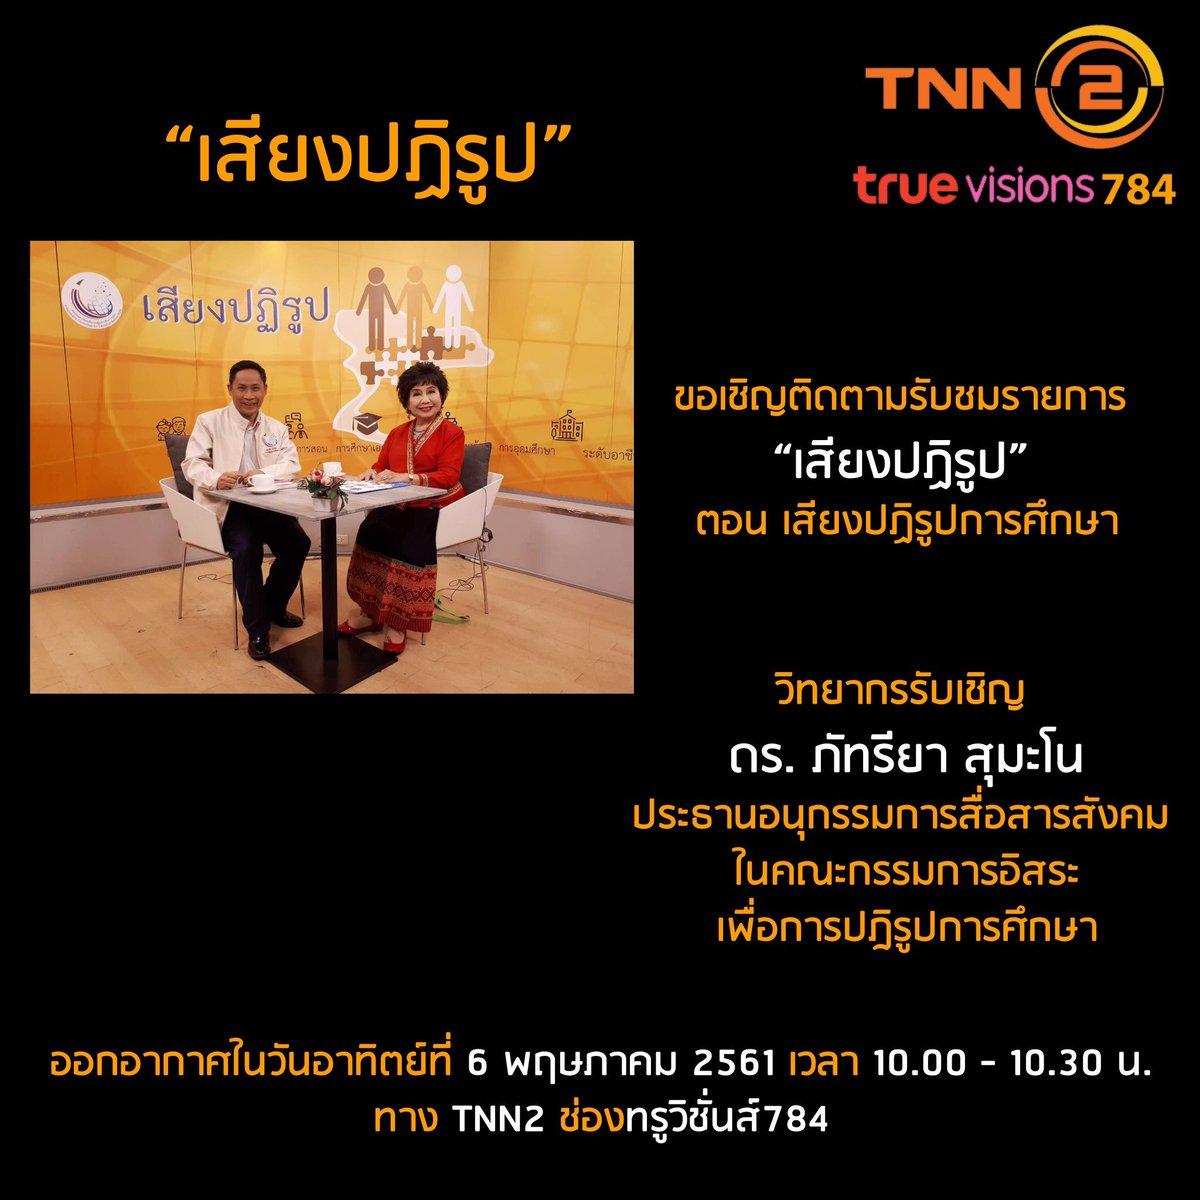 Tnn2 live